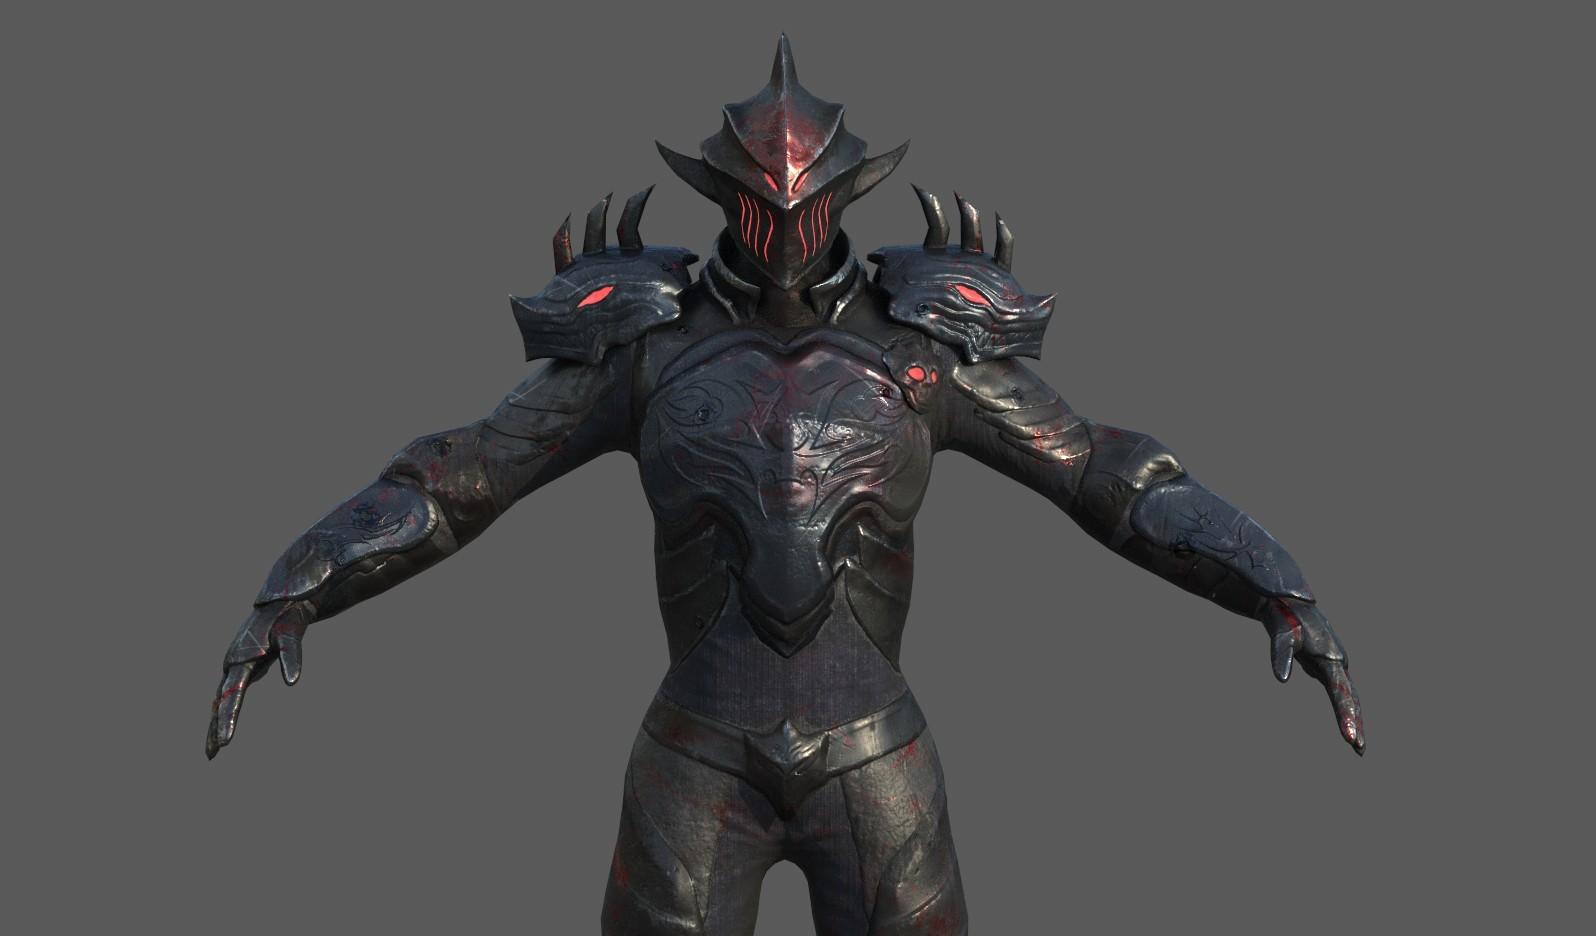 ArtStation - Armor darksoul mod dragon, tan tan